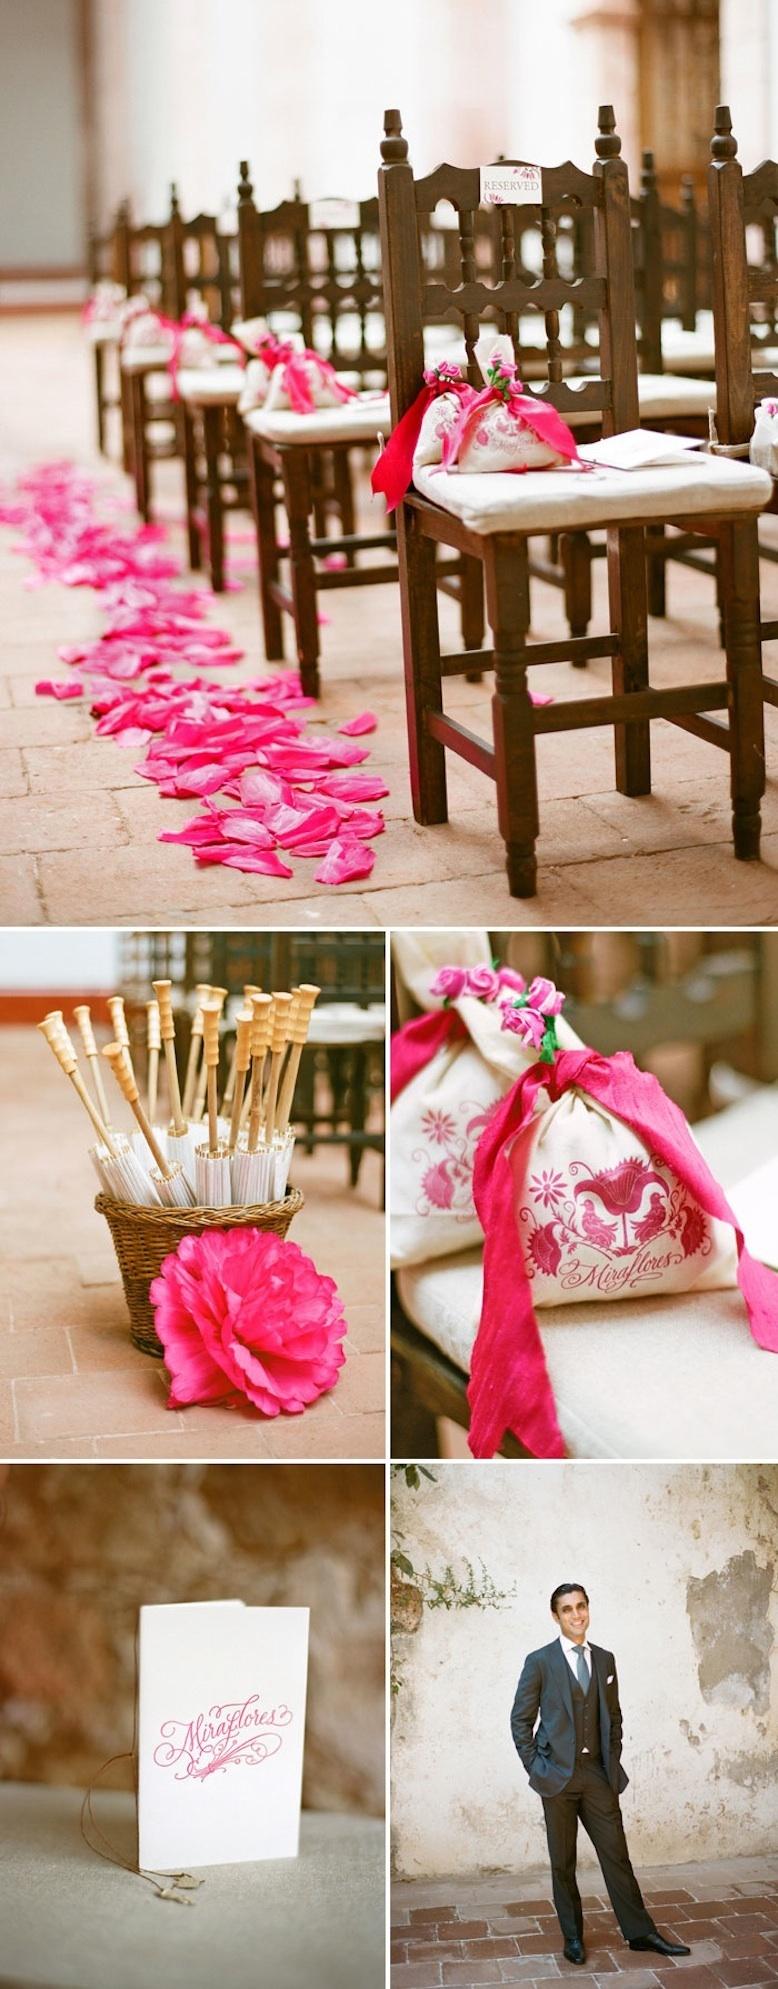 Hot-pink-wedding-ceremony-decor.full